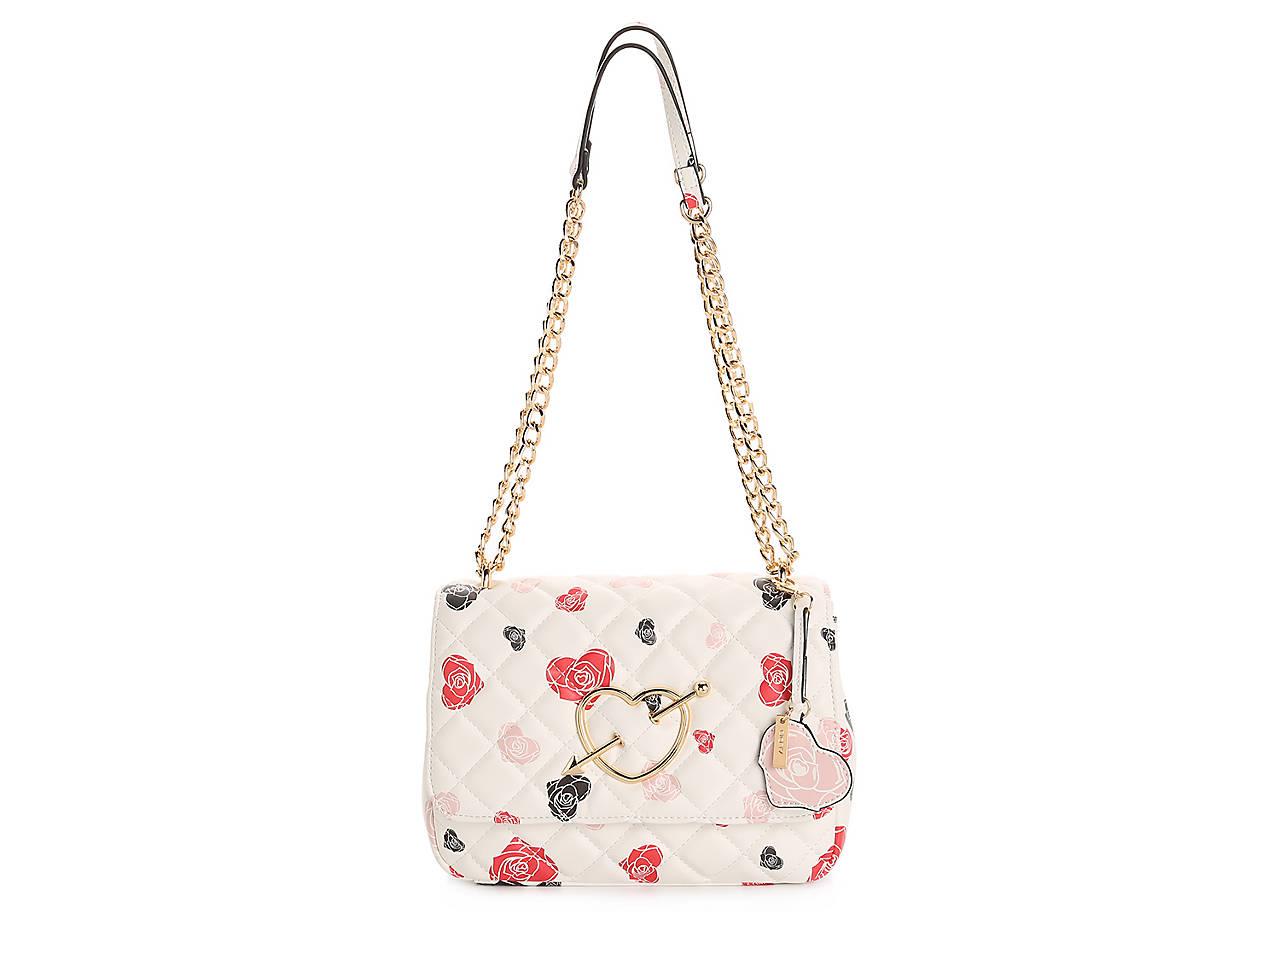 93caabfb7 Aldo Mallare Crossbody Bag Women's Handbags & Accessories   DSW